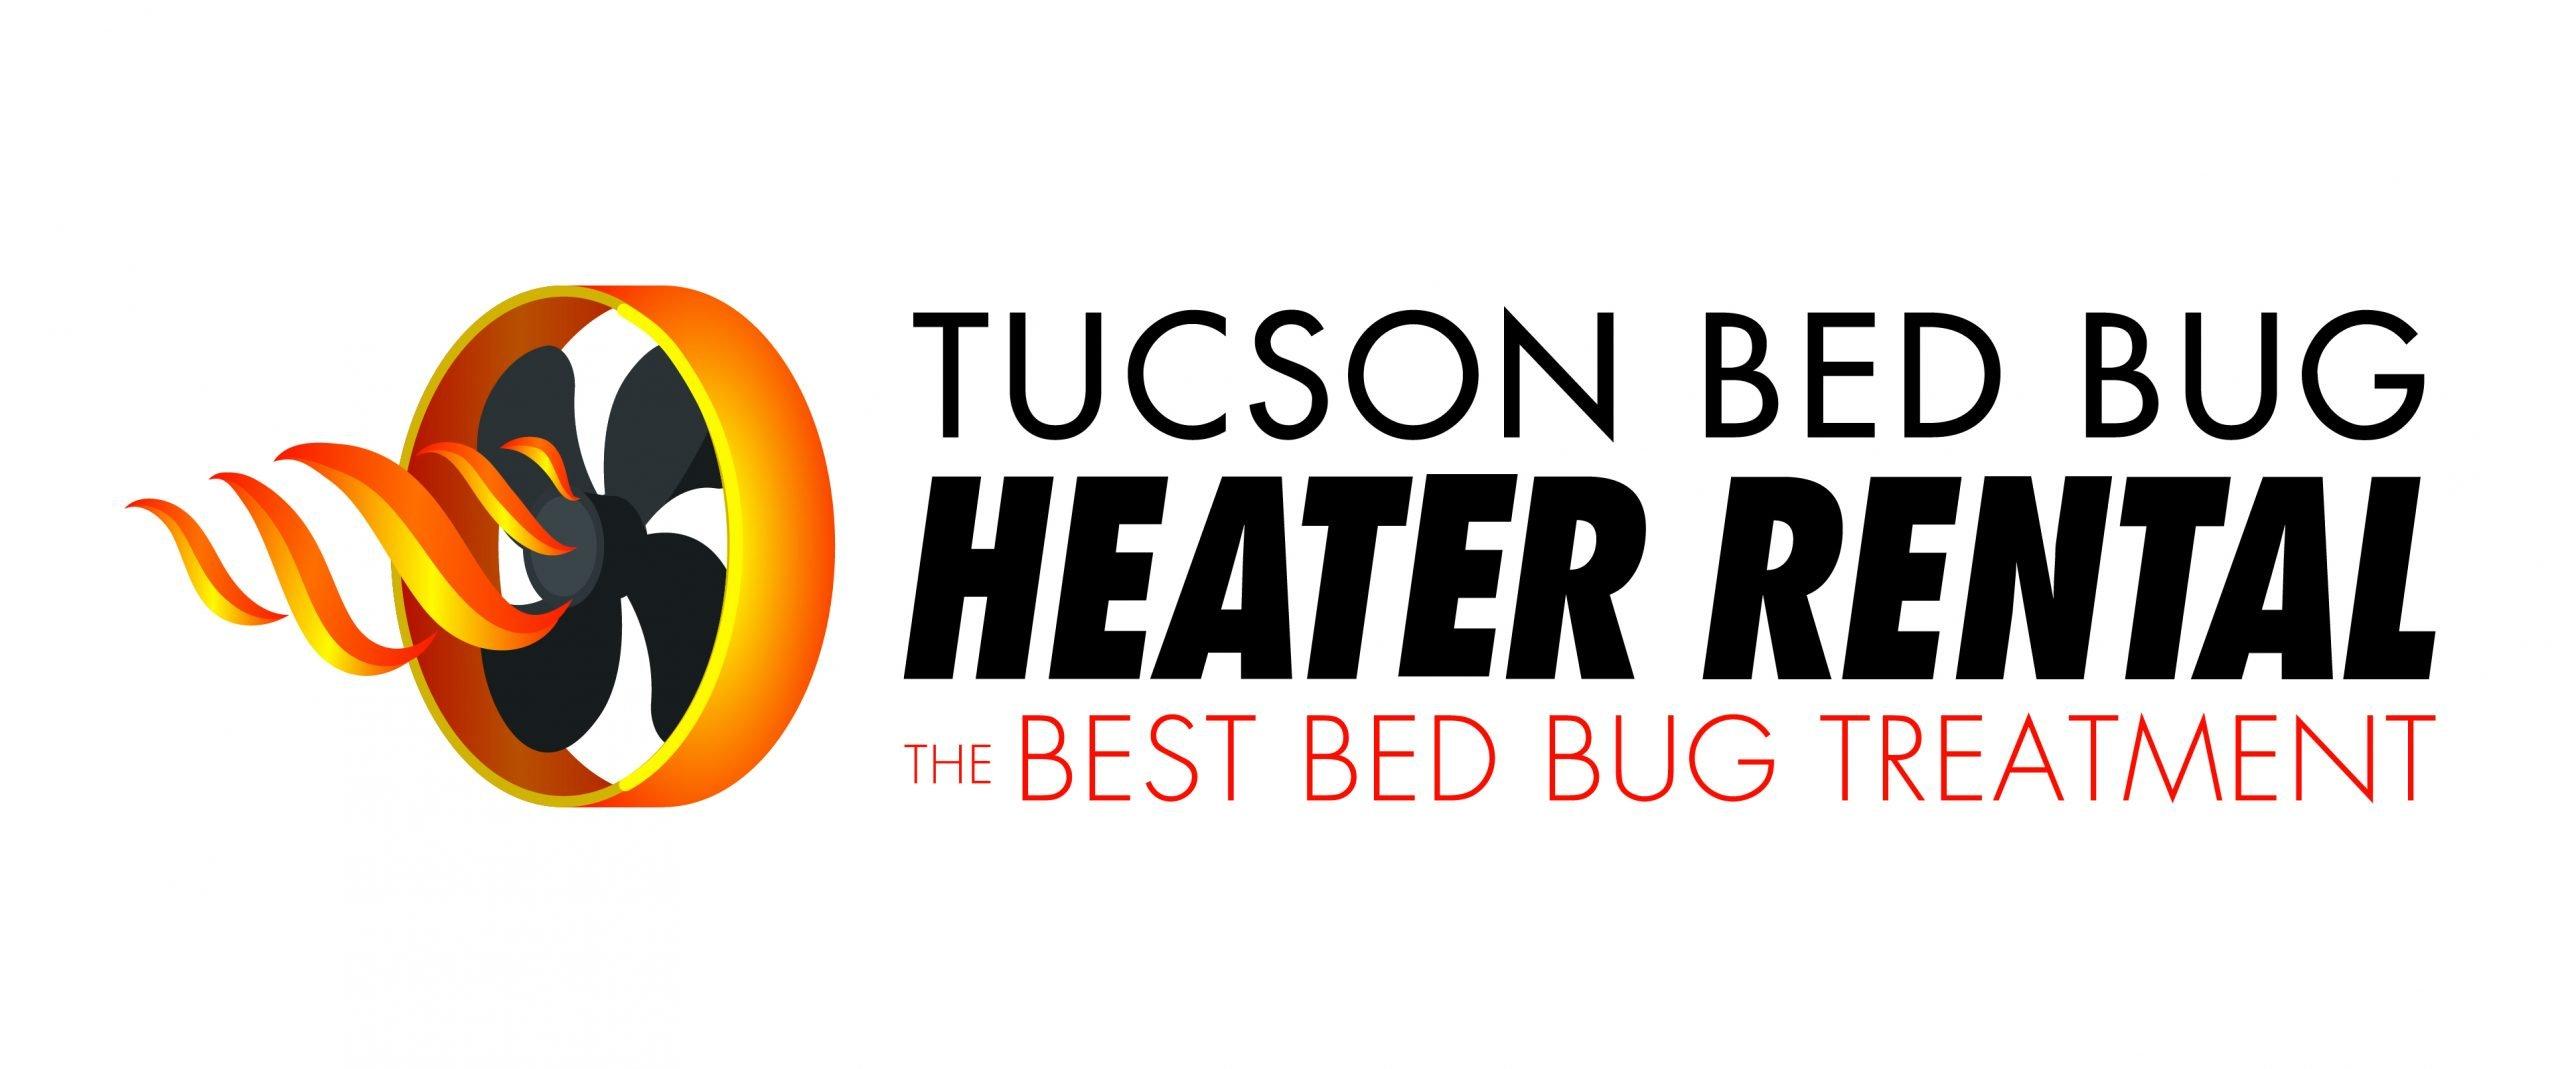 Tucson Bed Bug Heat Rental